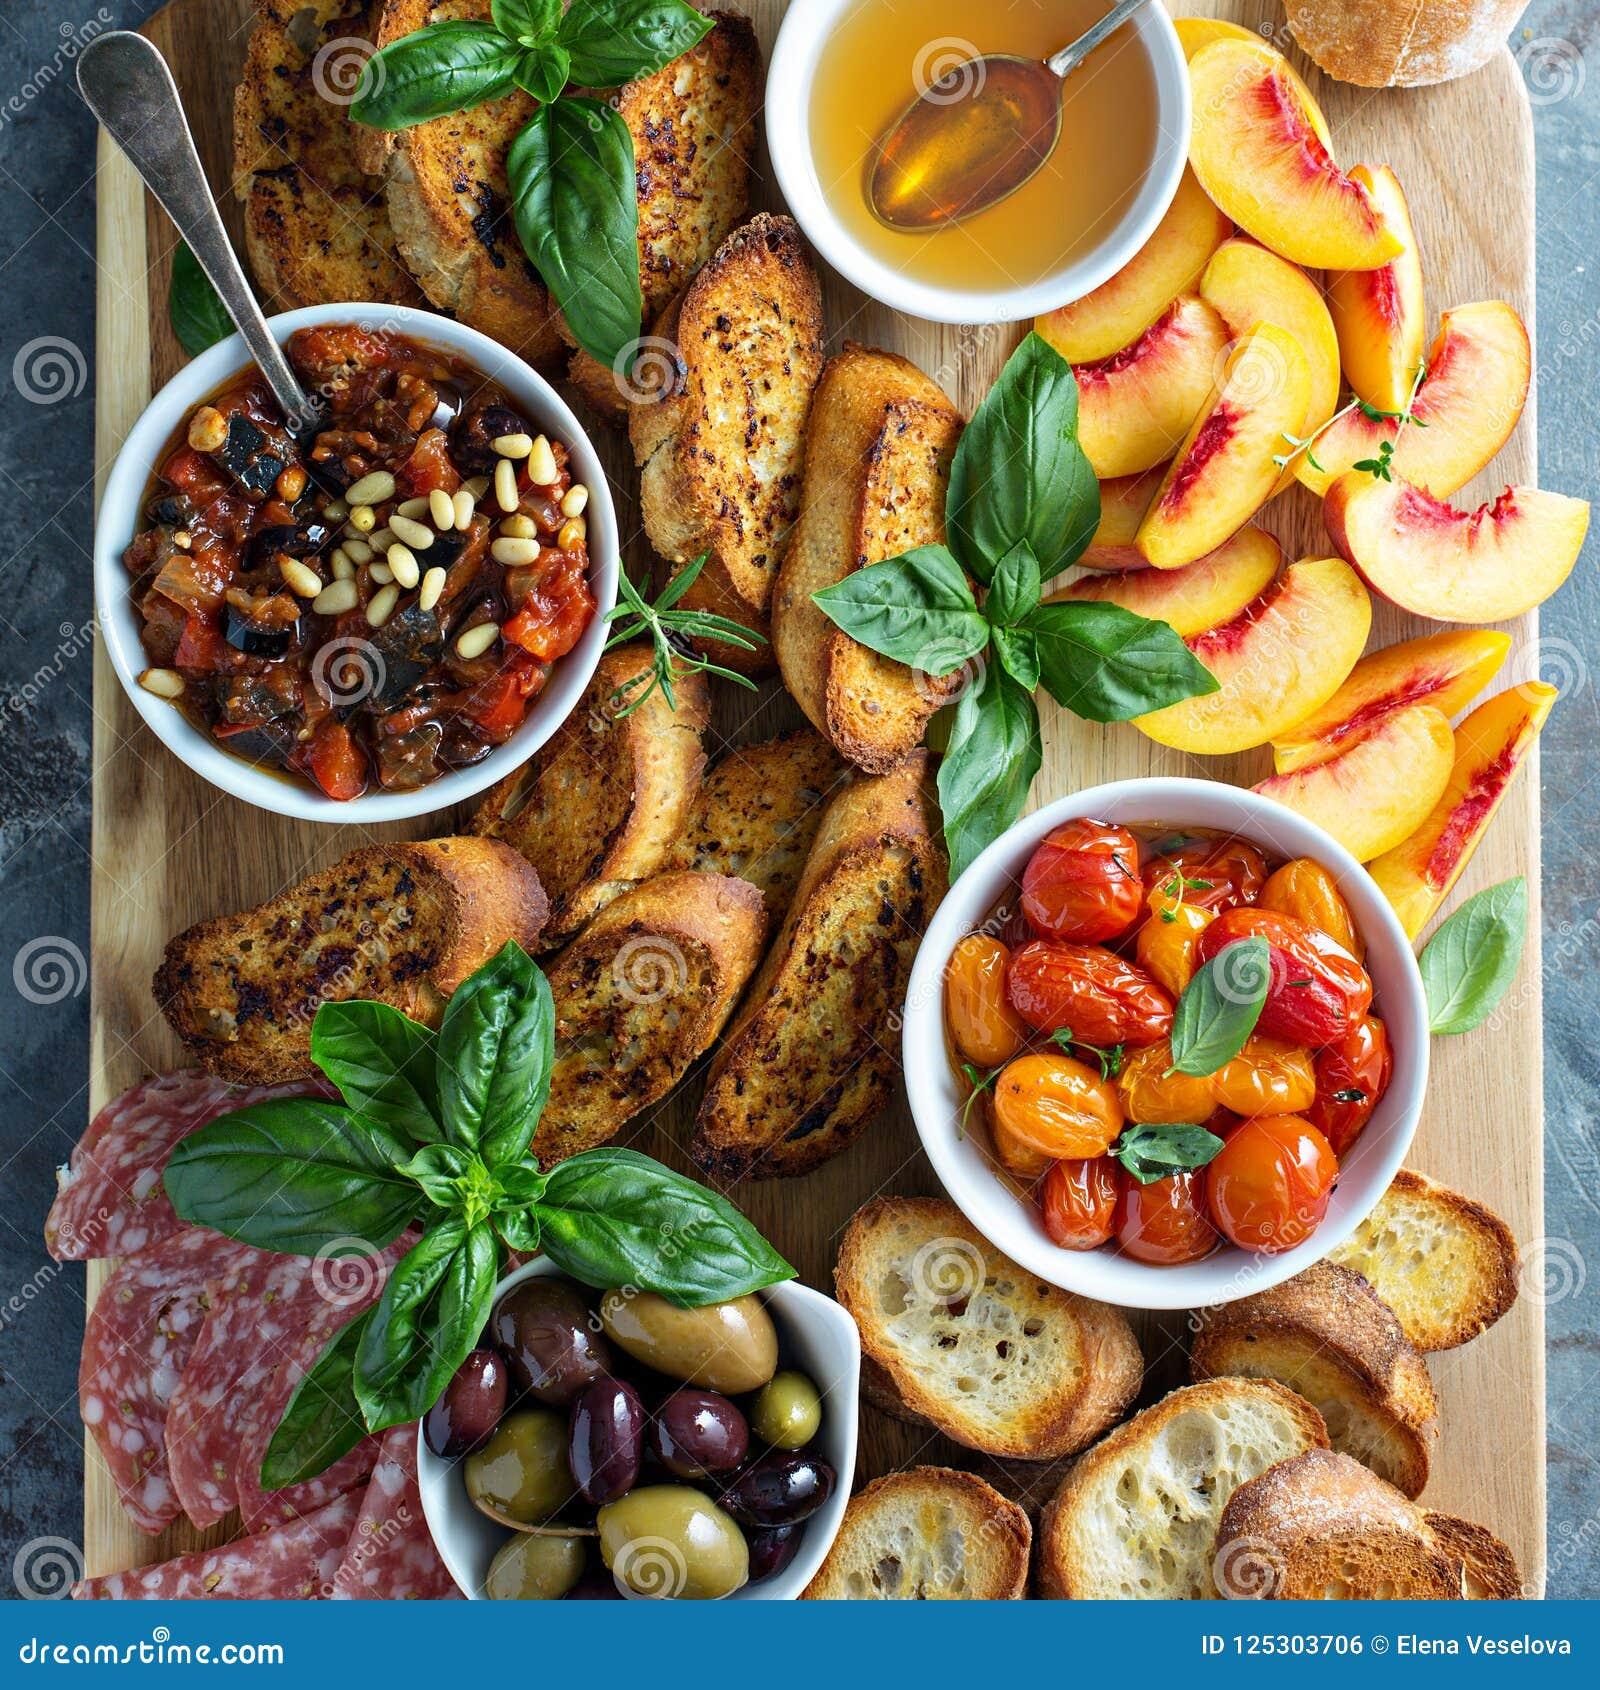 Crostiniraad met tomaten, perziken en onderdompeling